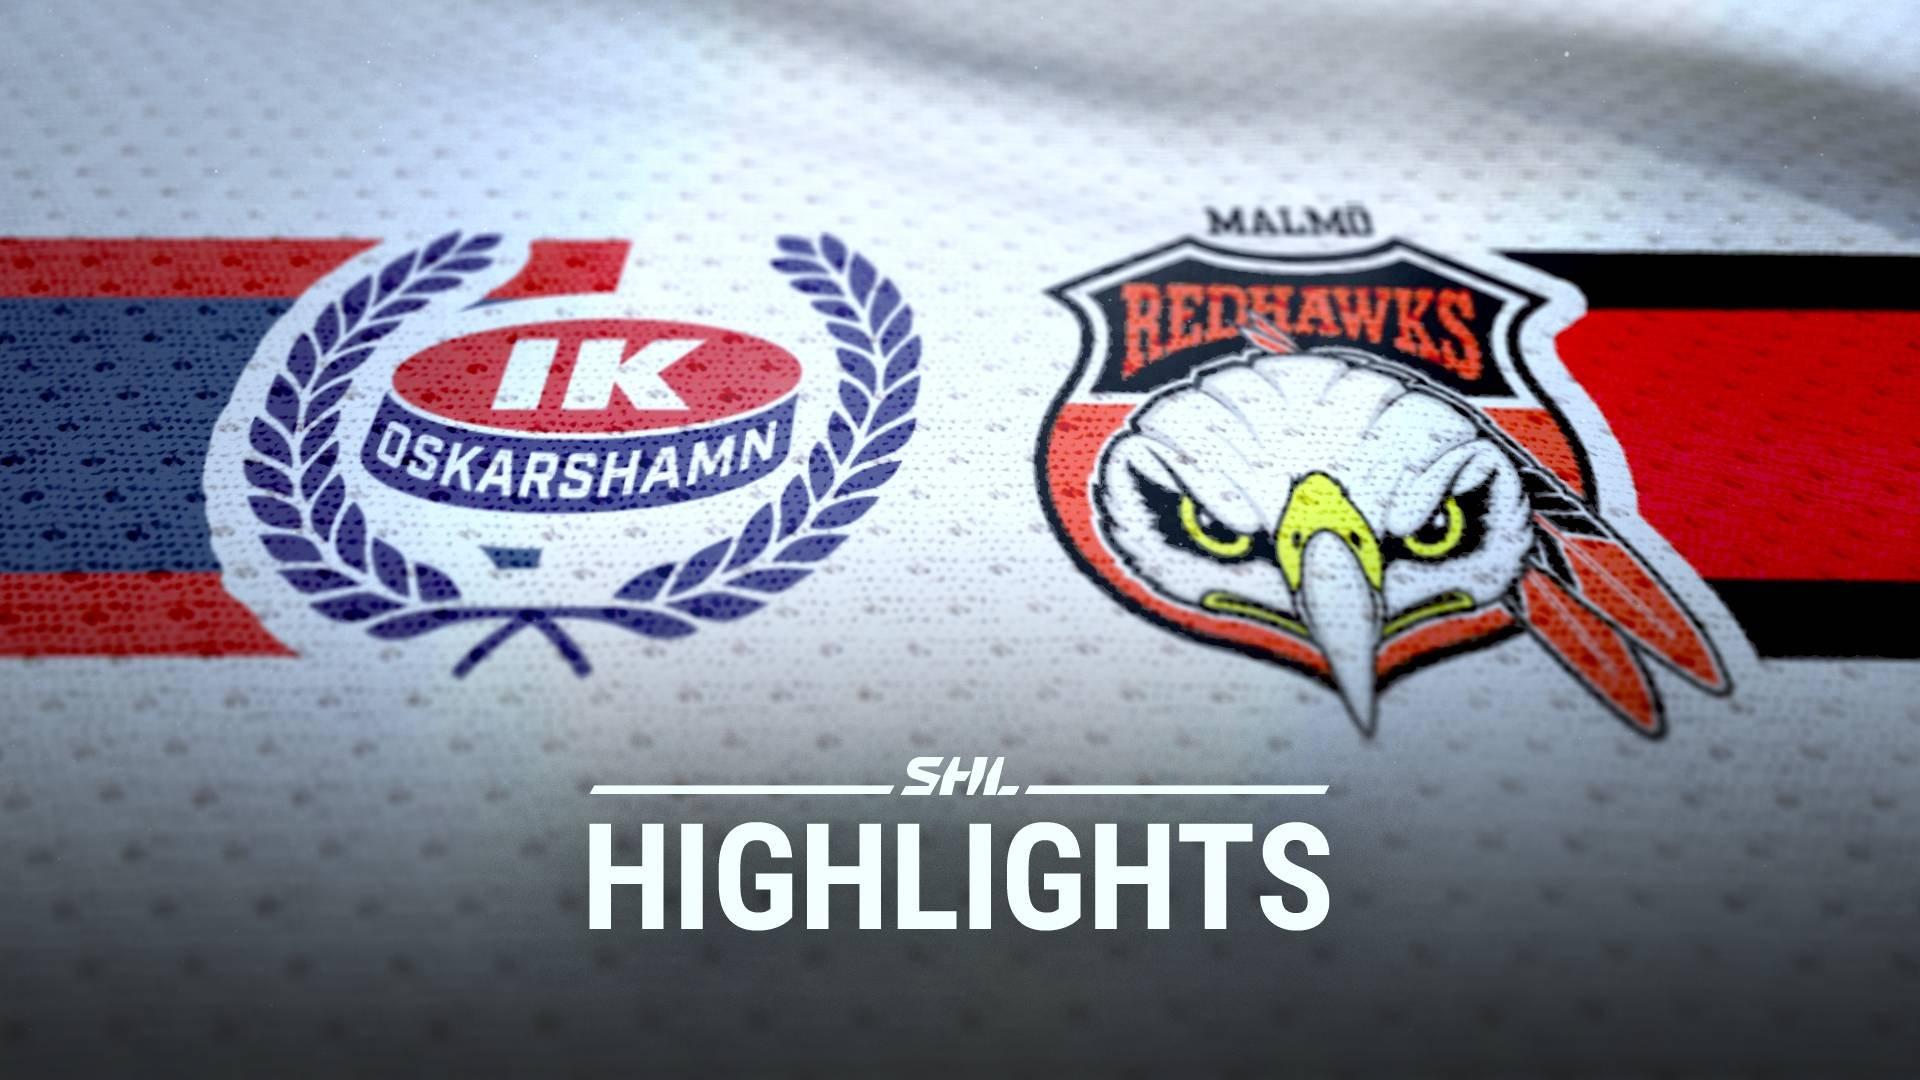 IK Oskarshamn - Malmö Redhawks